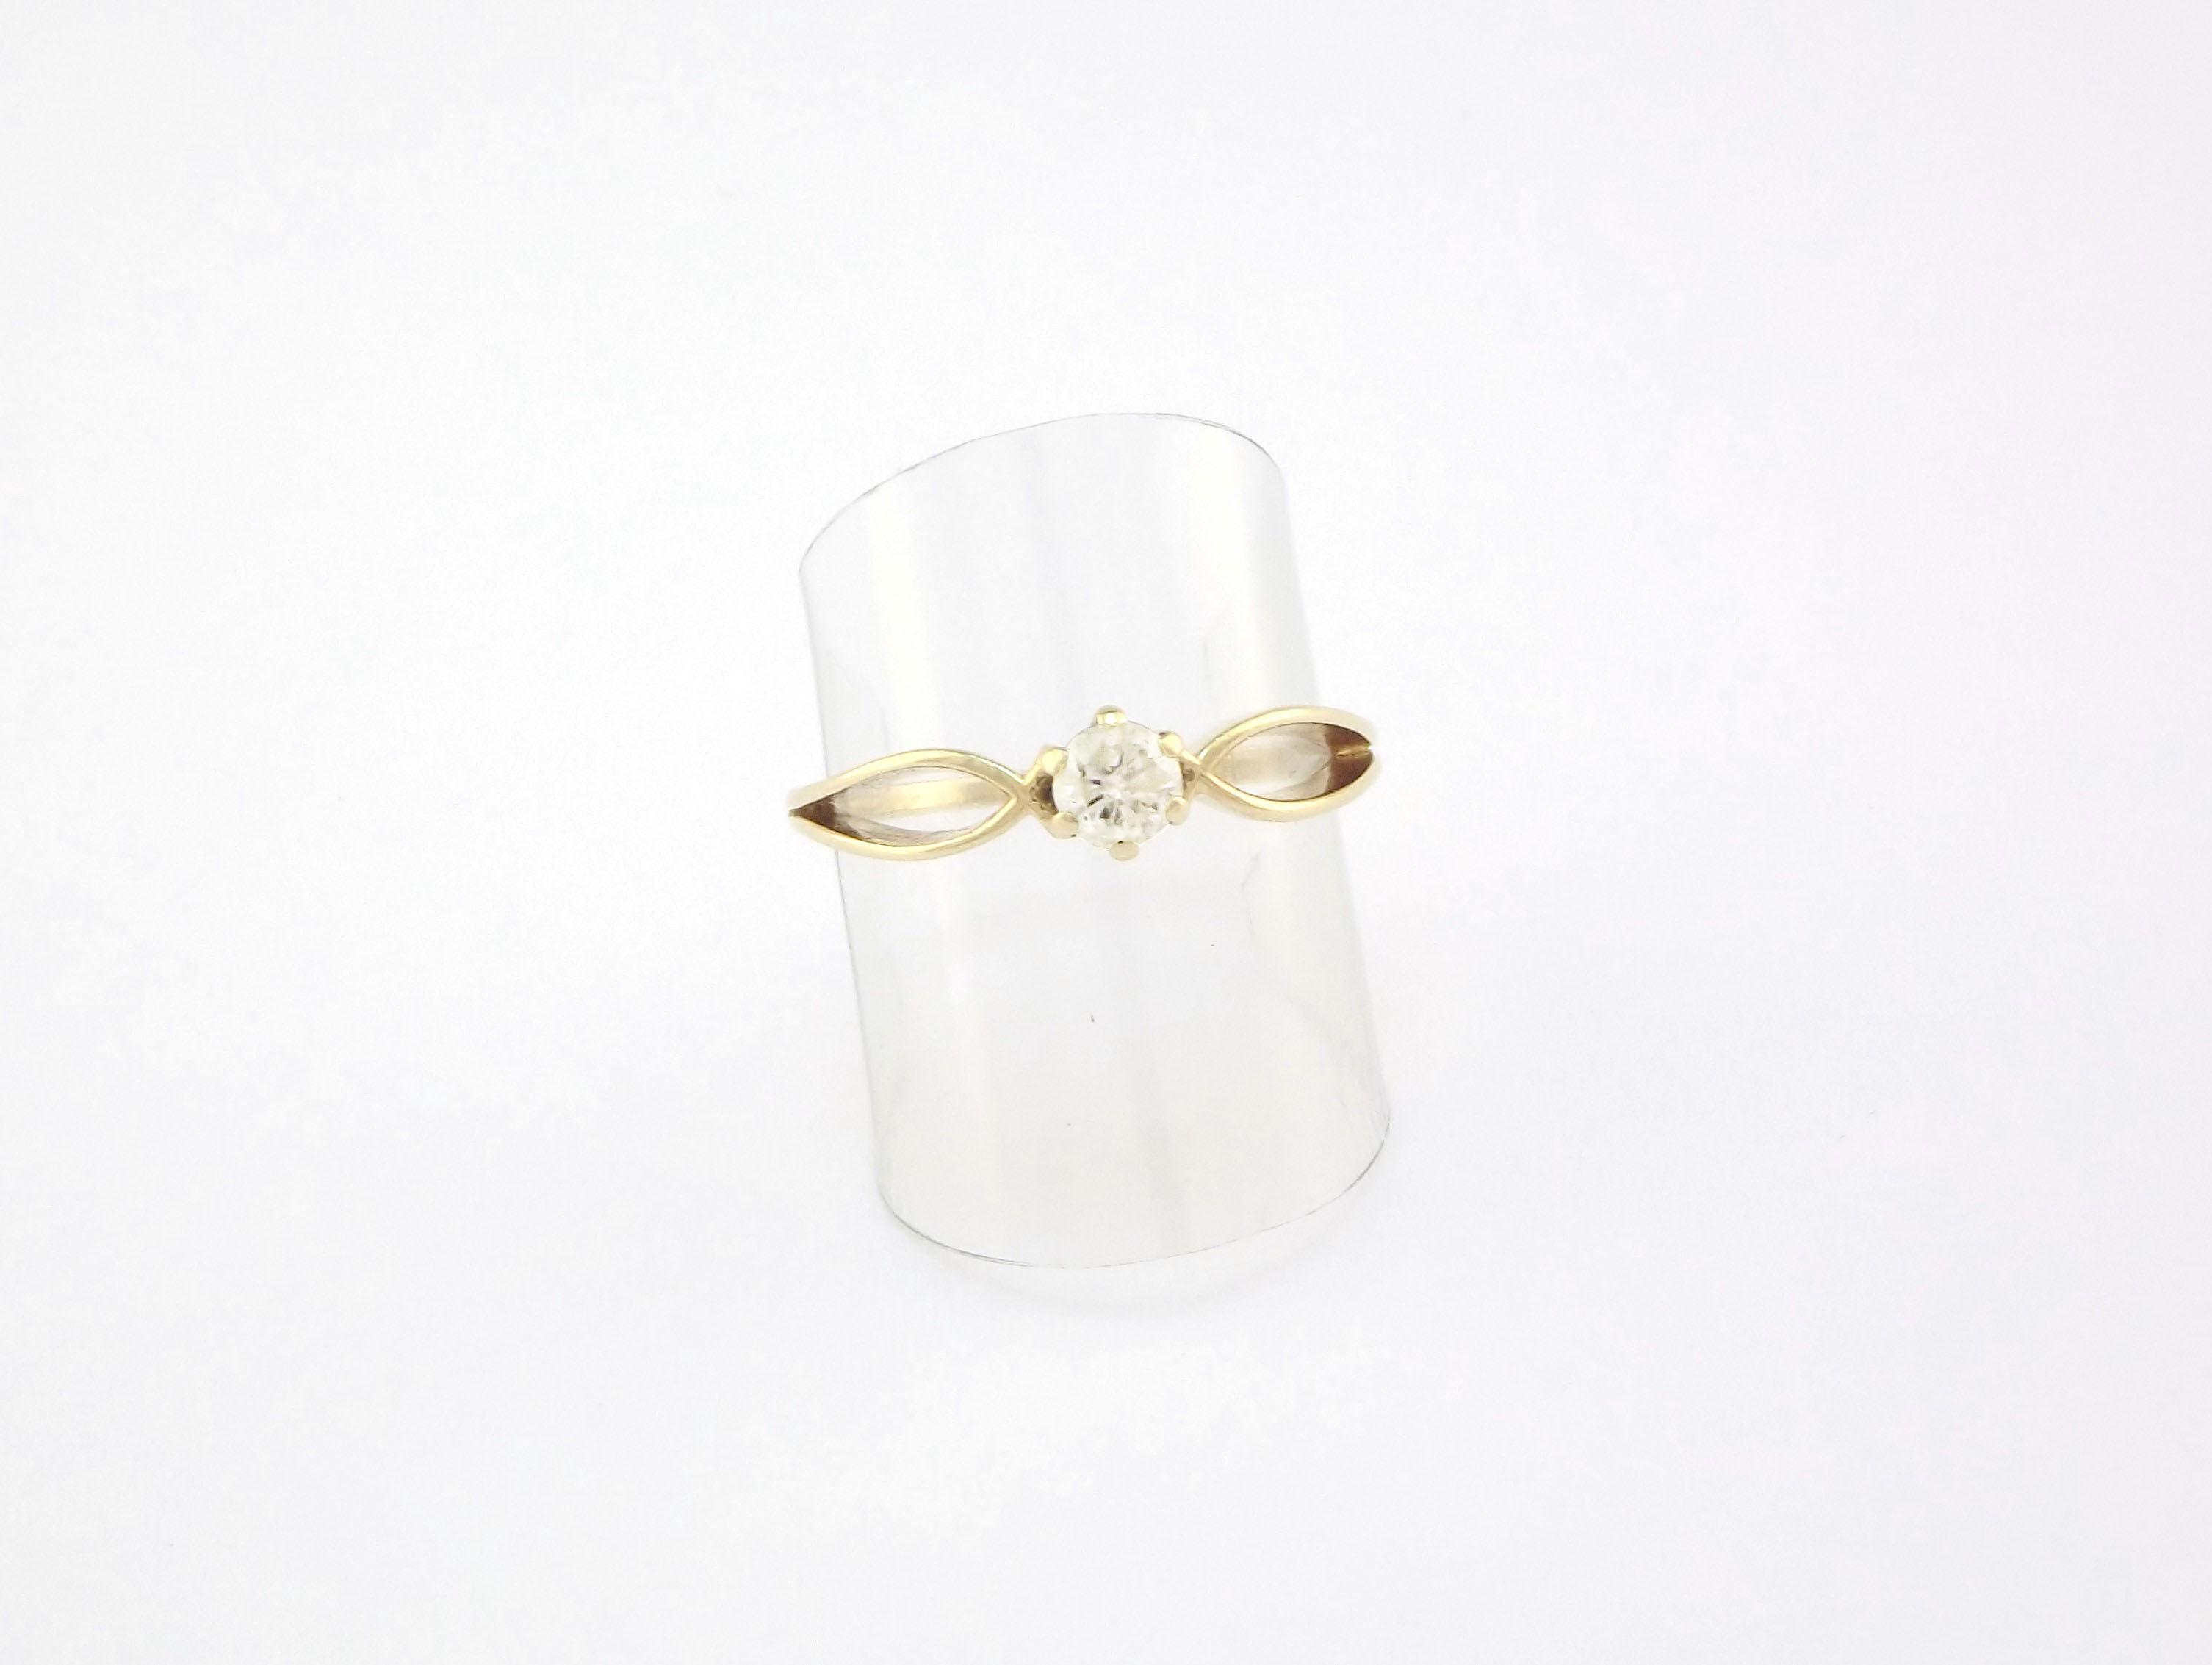 billige diamant øreringe